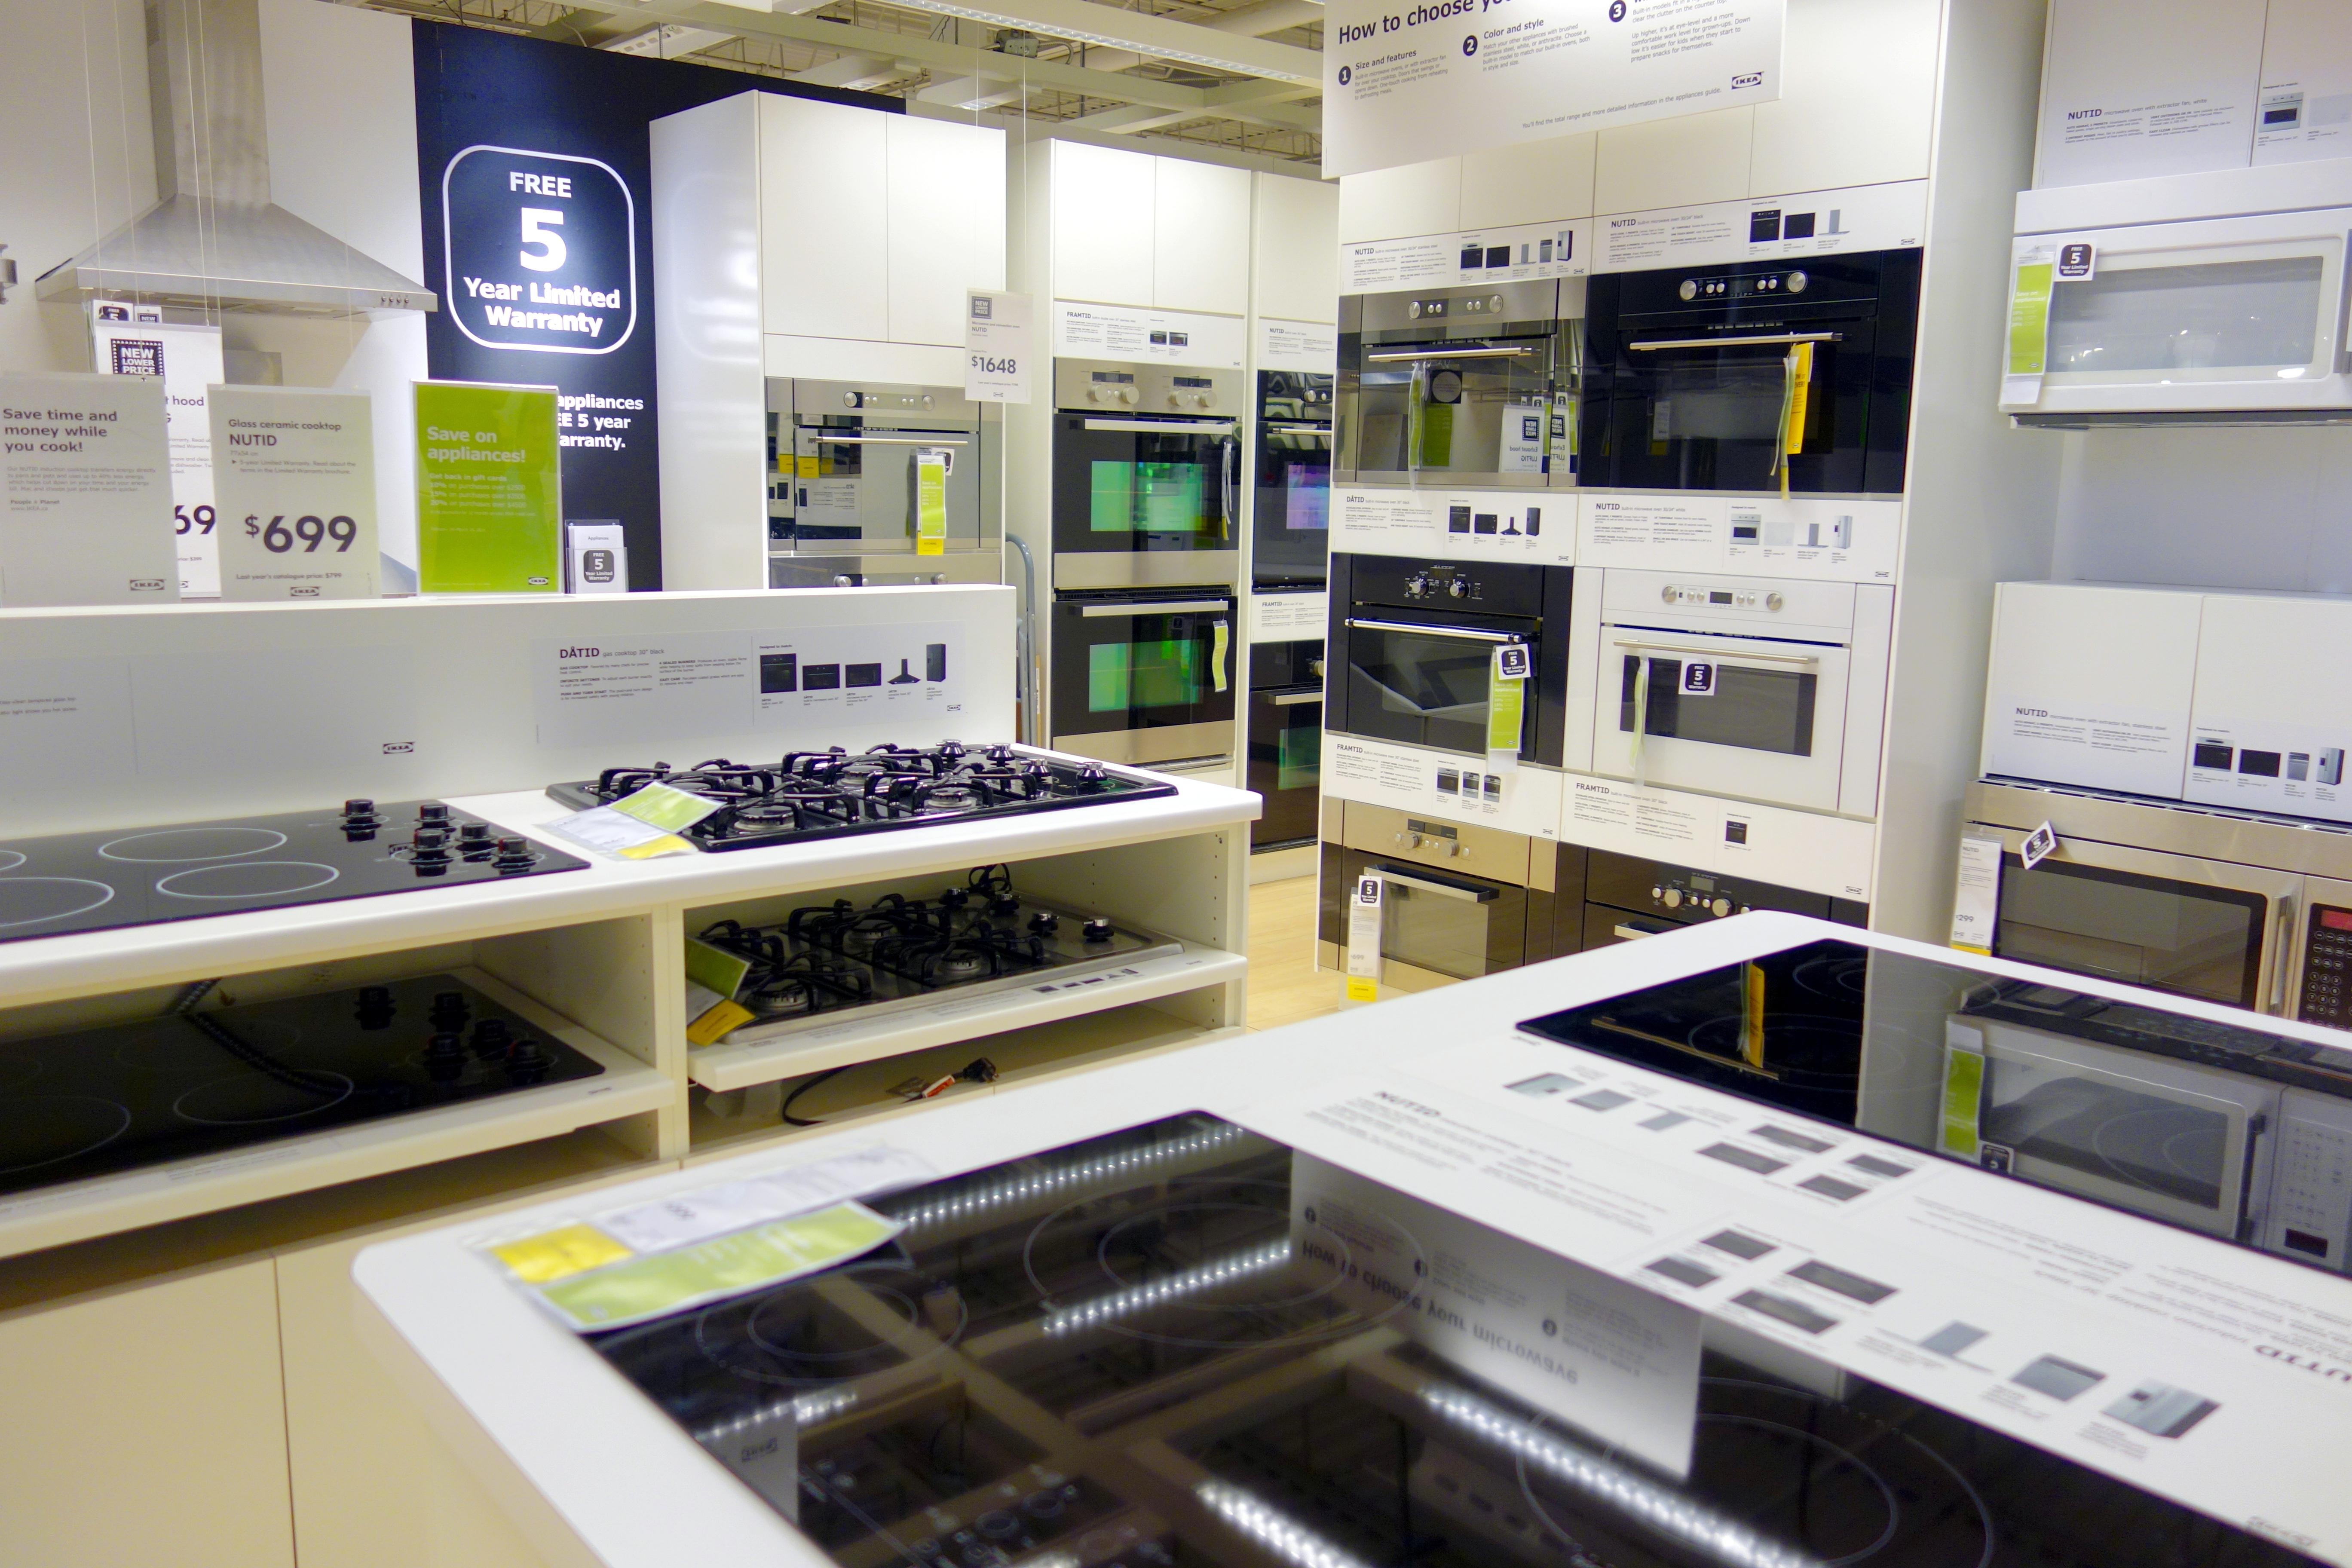 IKEA Kitchen Sale 2018 - Secret Shopping Tips   Apartment